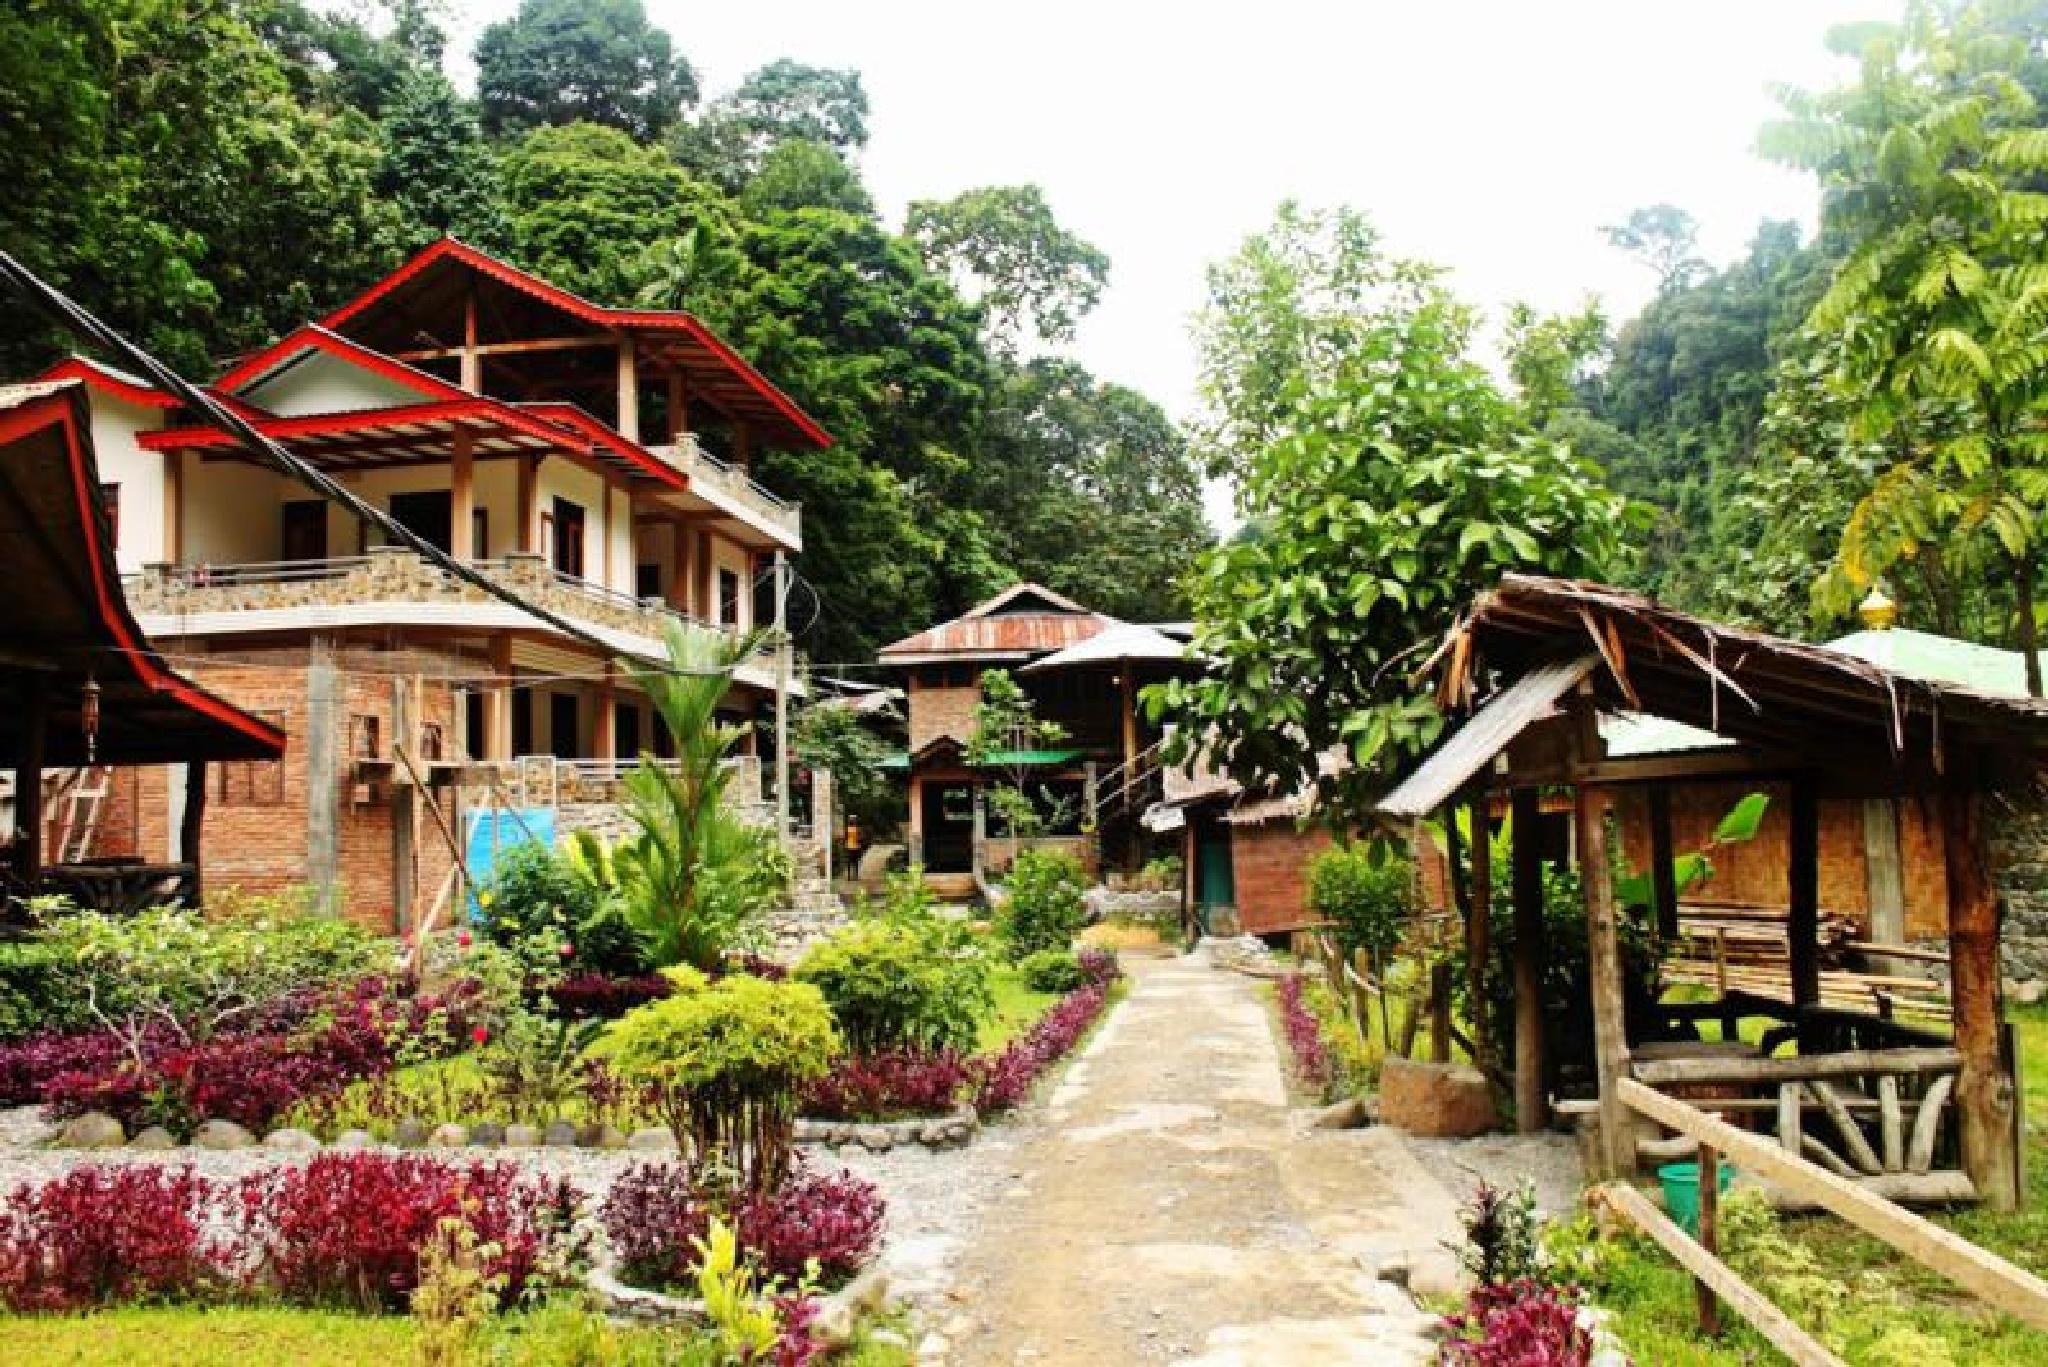 Bukit Lawang cottage Medan Natural beauty by Muhammad Fandy